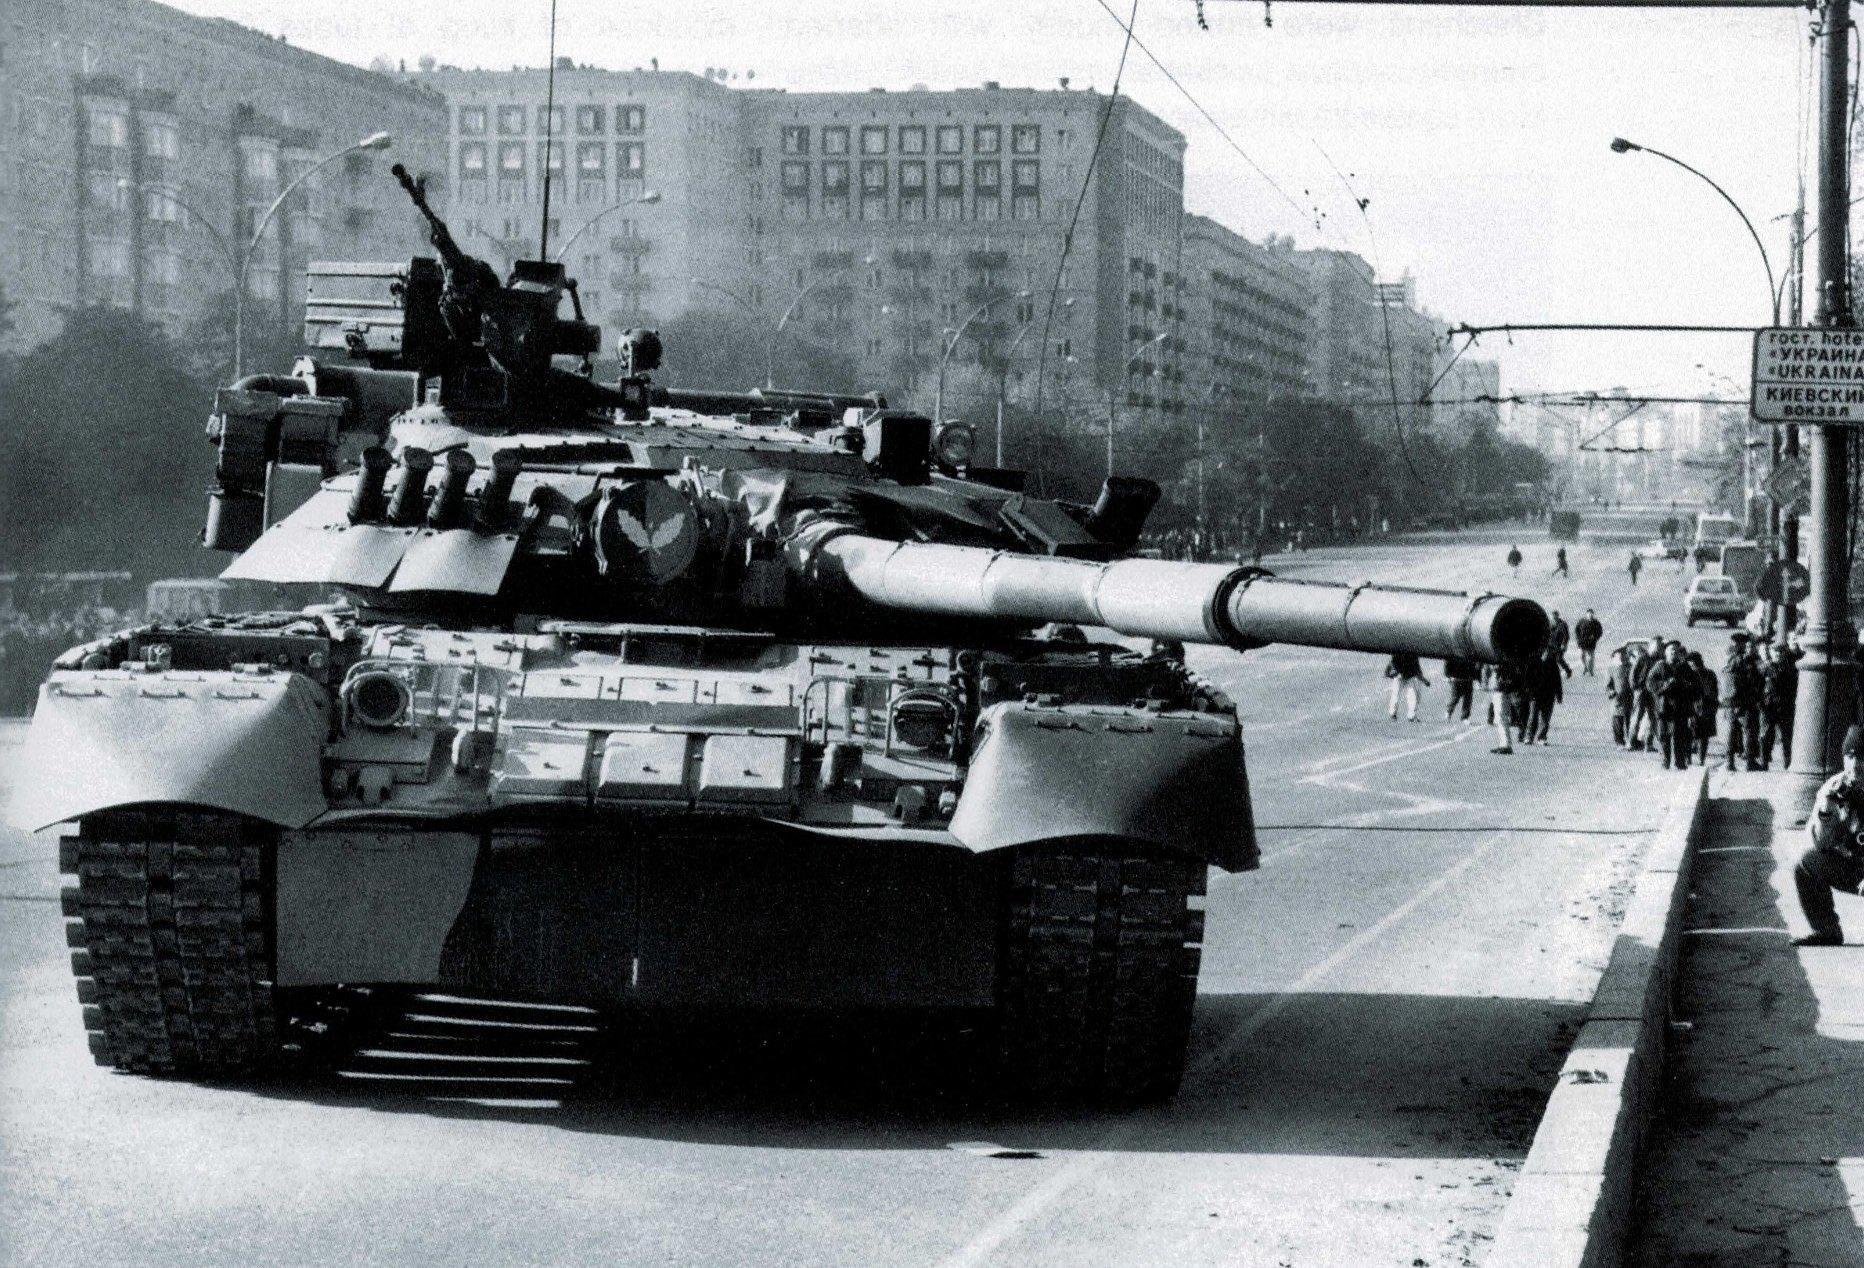 Кутузовский проспект. Танк Т-80УД. Дана команда «Товсь!»